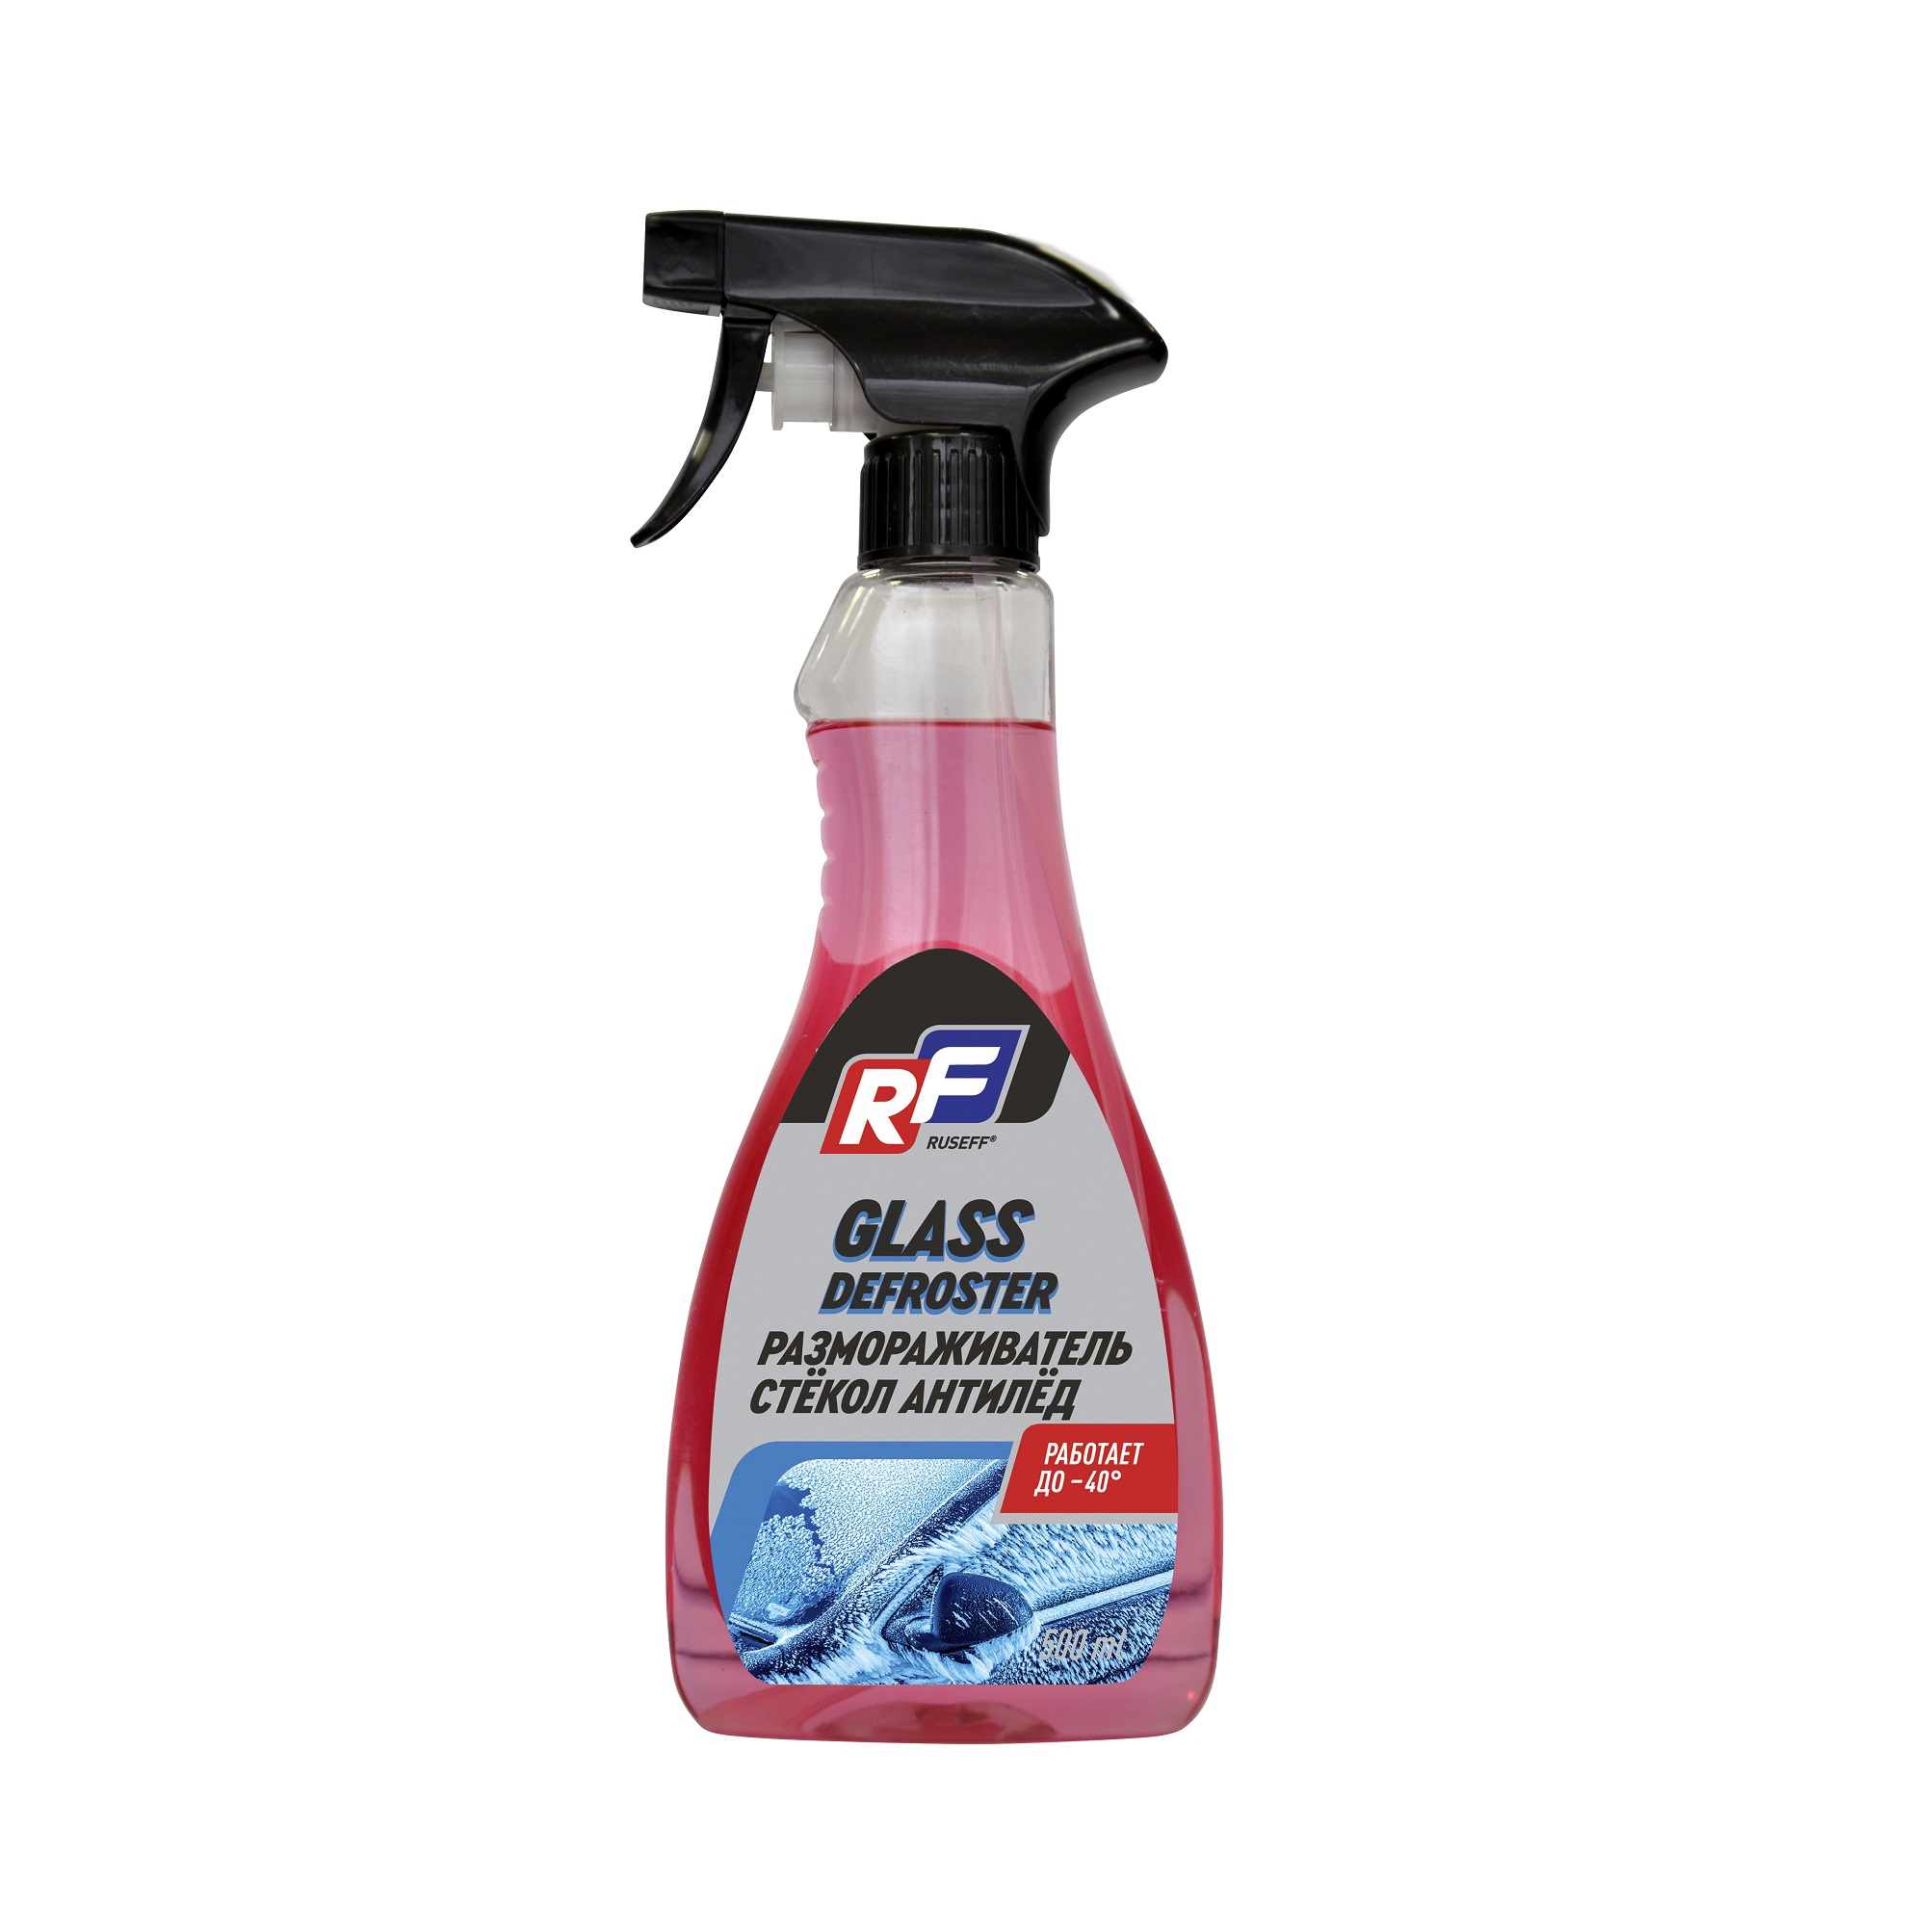 Размораживатель стекол антилед Ruseff 0,5 л